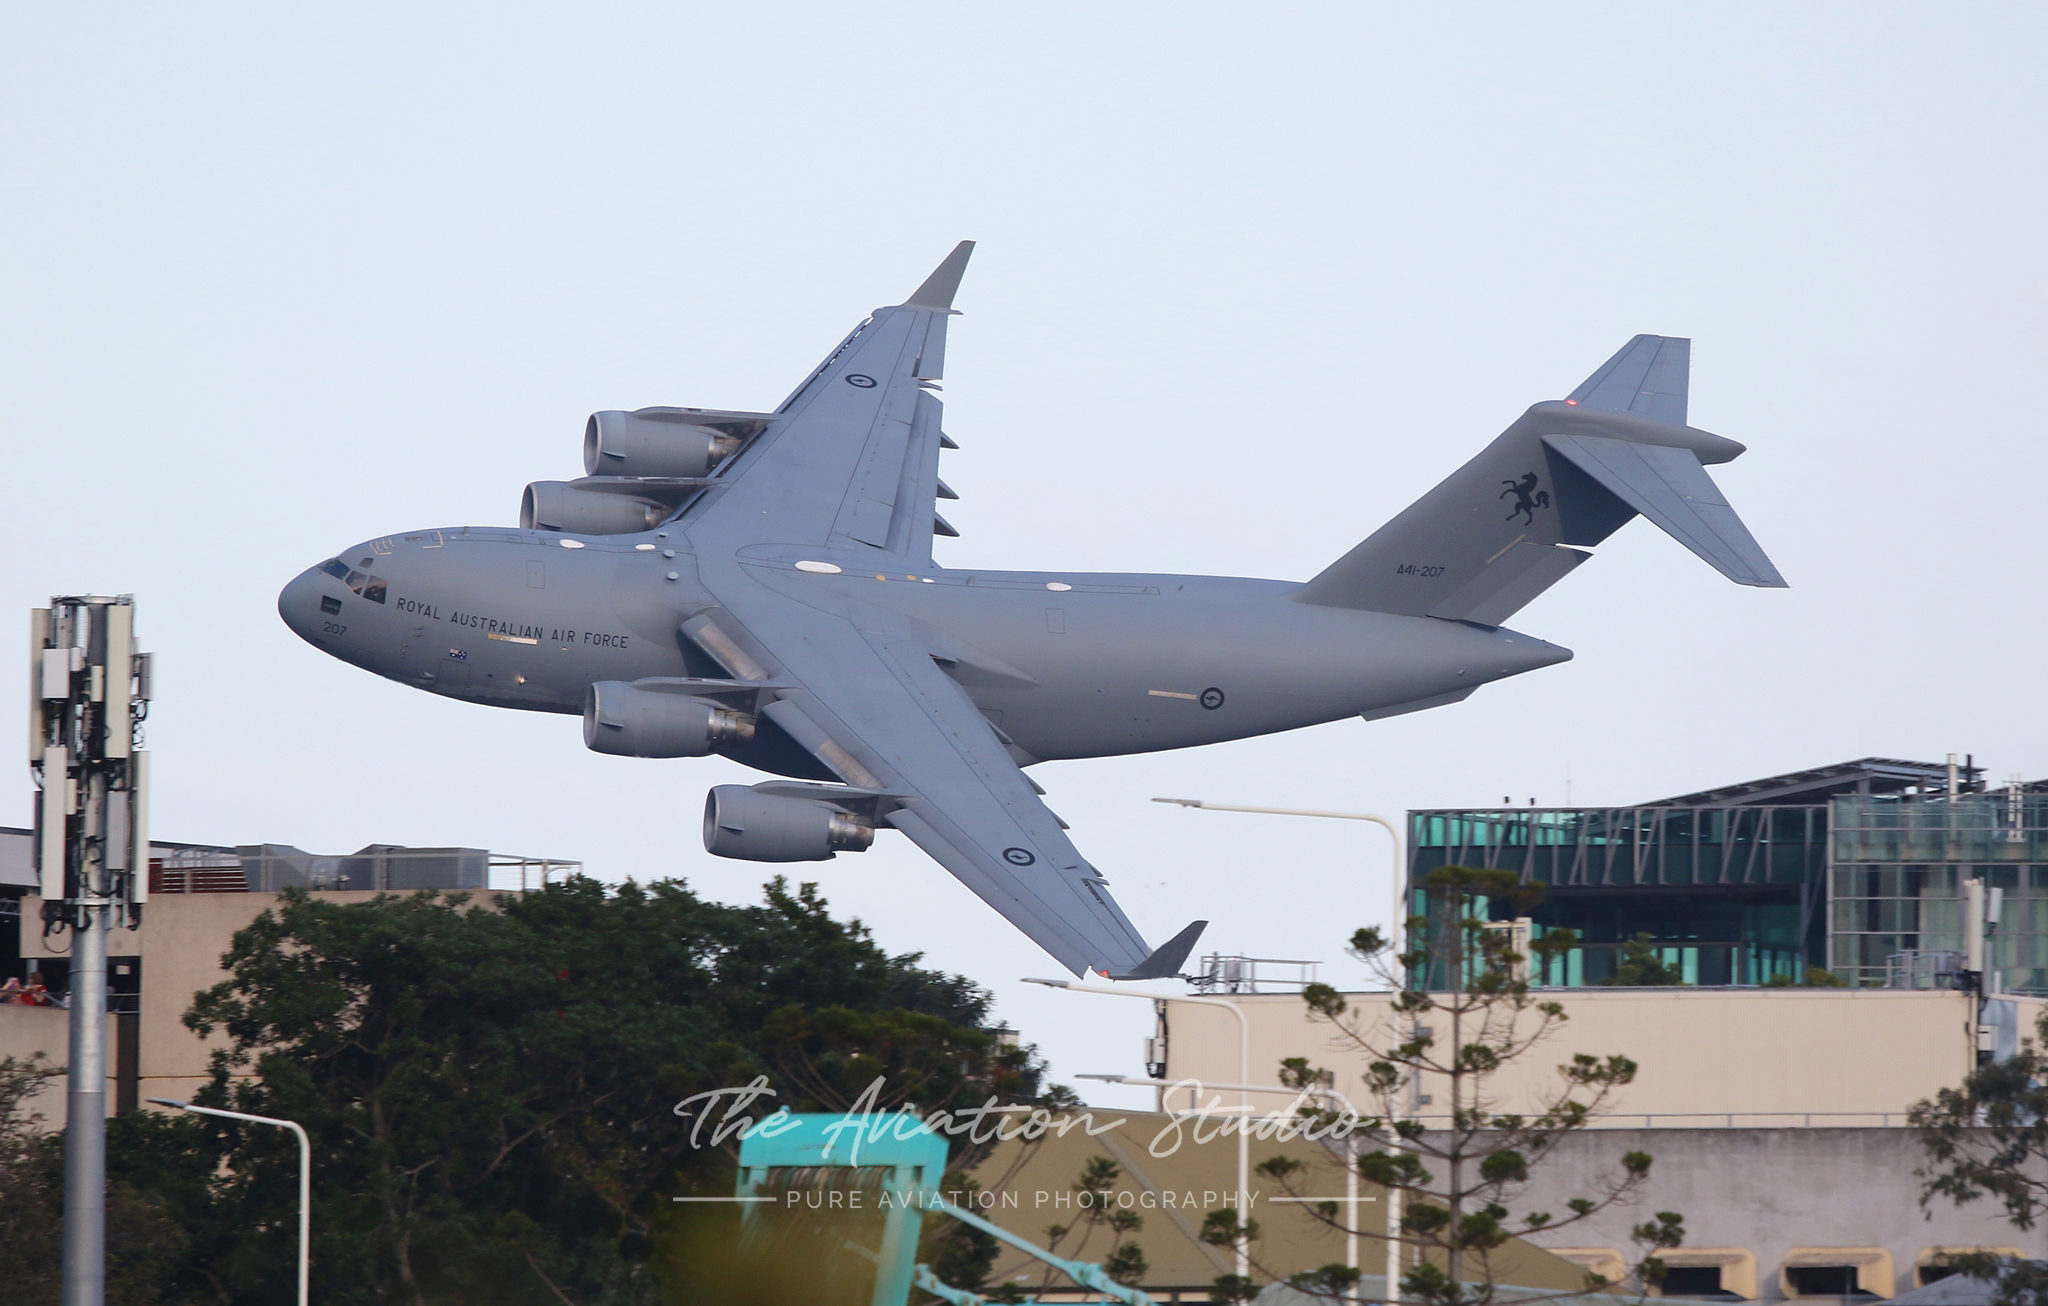 A Royal Australian Air Force C-17 at Riverfire Brisbane 2019